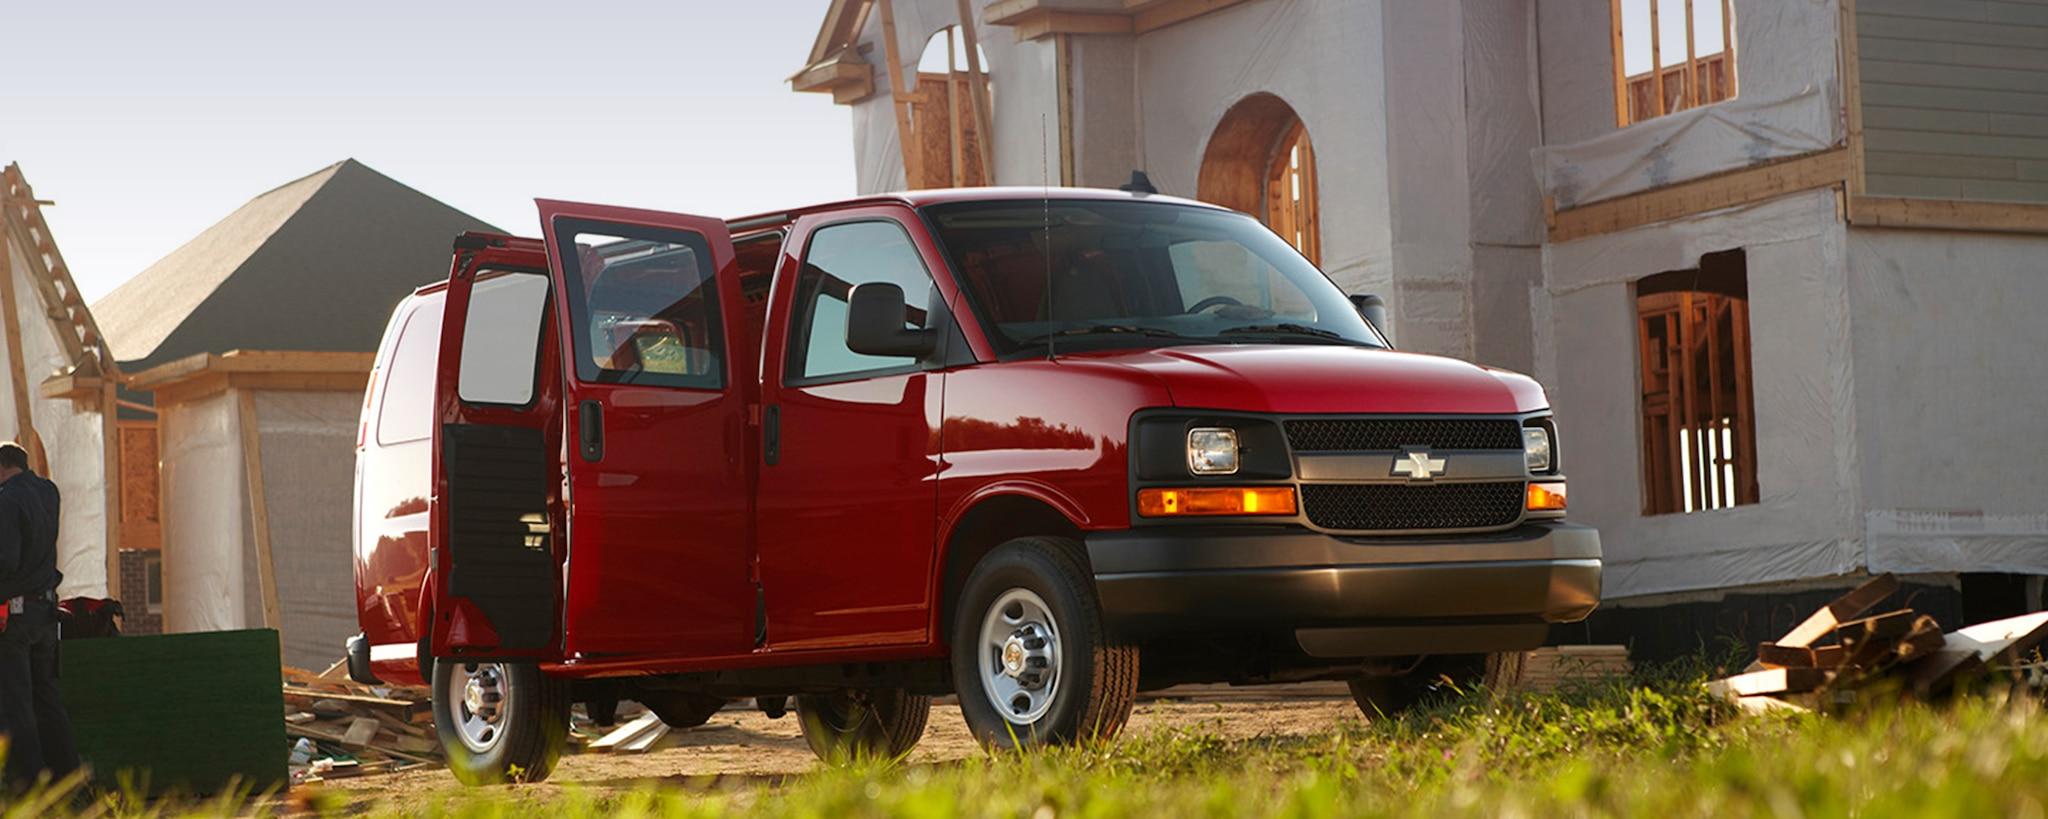 Van comercial de Chevrolet